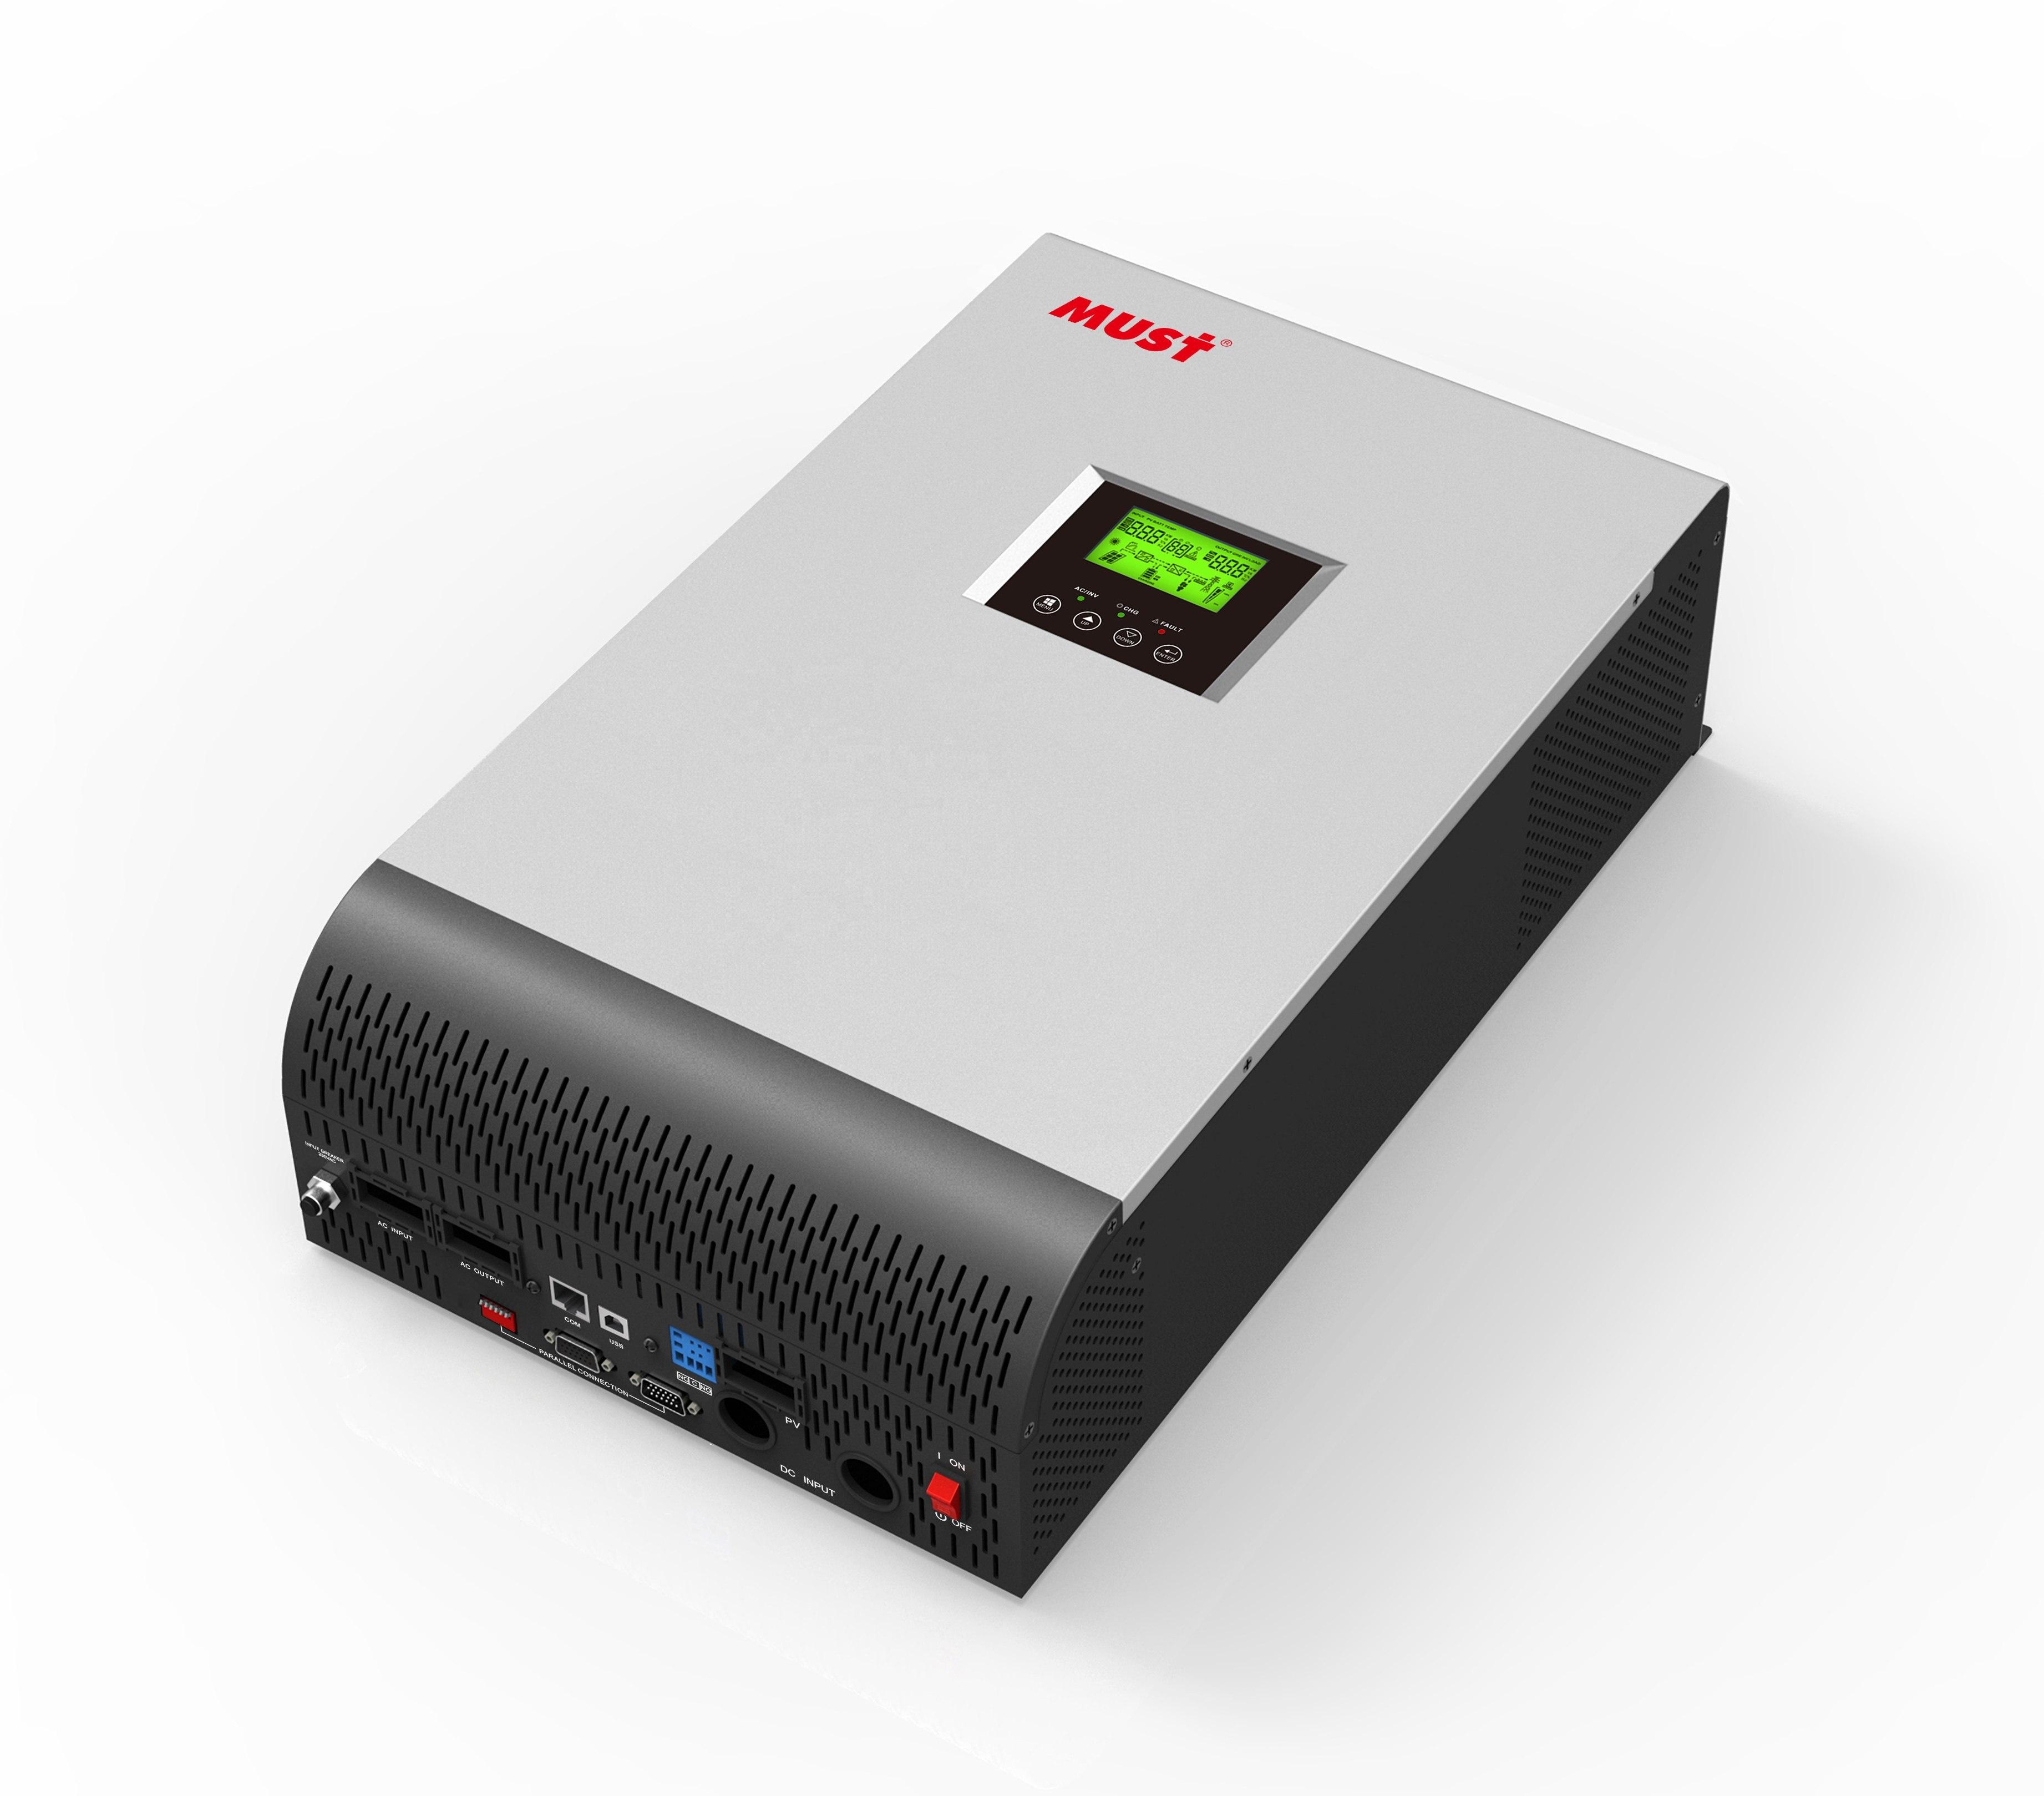 Fabrika kapalı ızgara güneş hibrid invertör 1KVA 3KVA 5KVA PV1800 mppt 80a ev kullanımı için